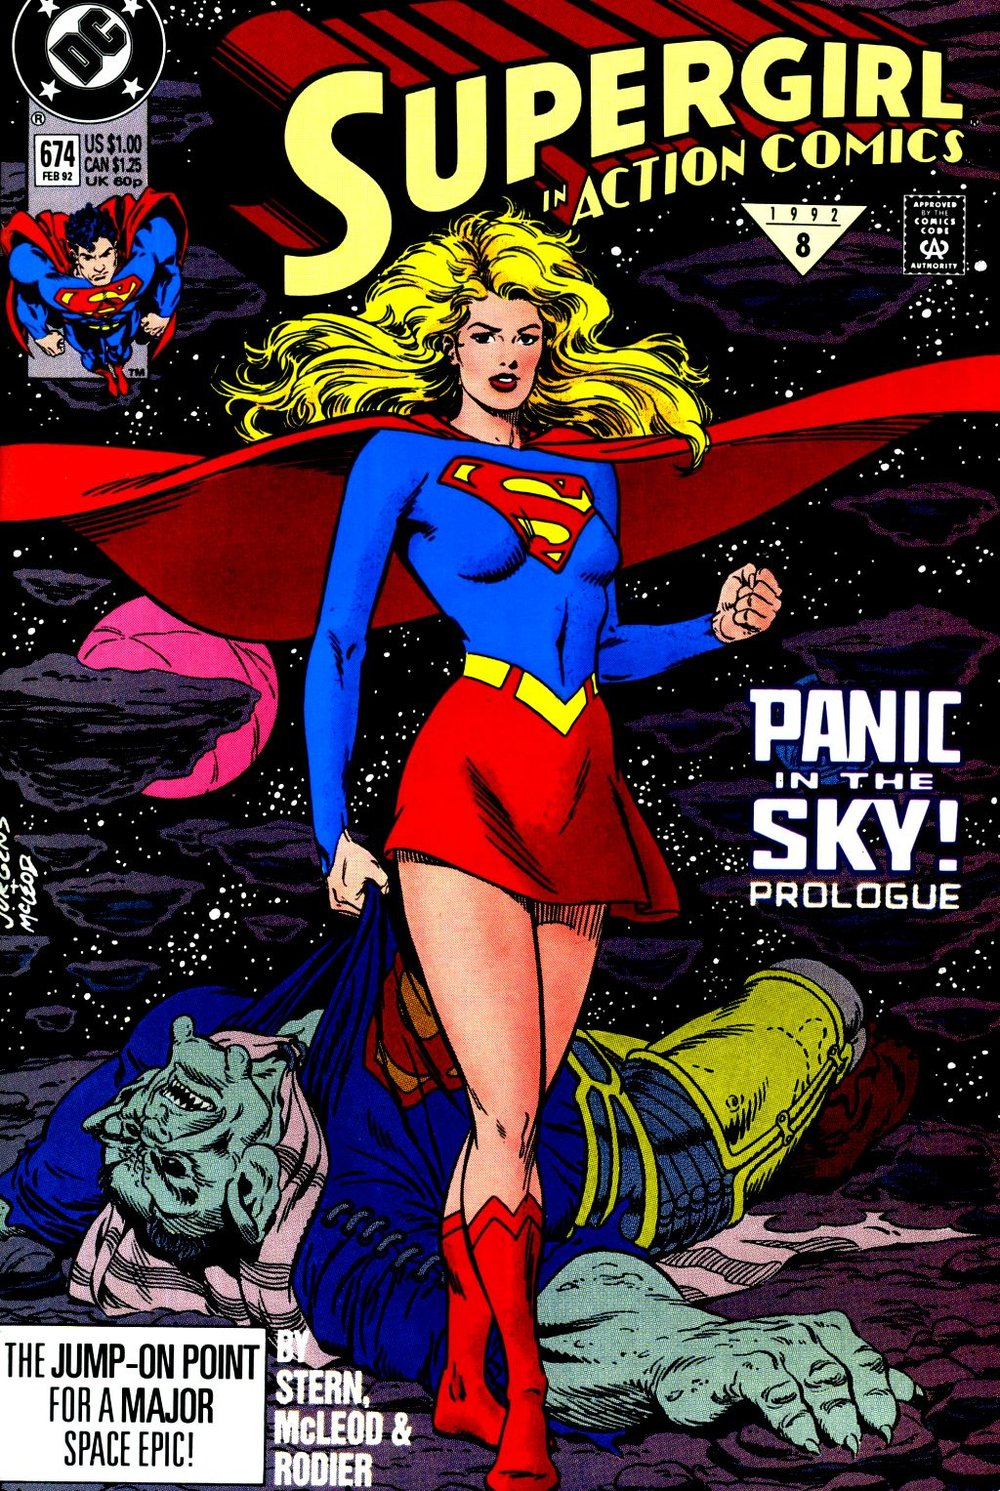 Action Comics (1938) #674, cover penciled by Dan Jurgens & inked by Bob McLeod.